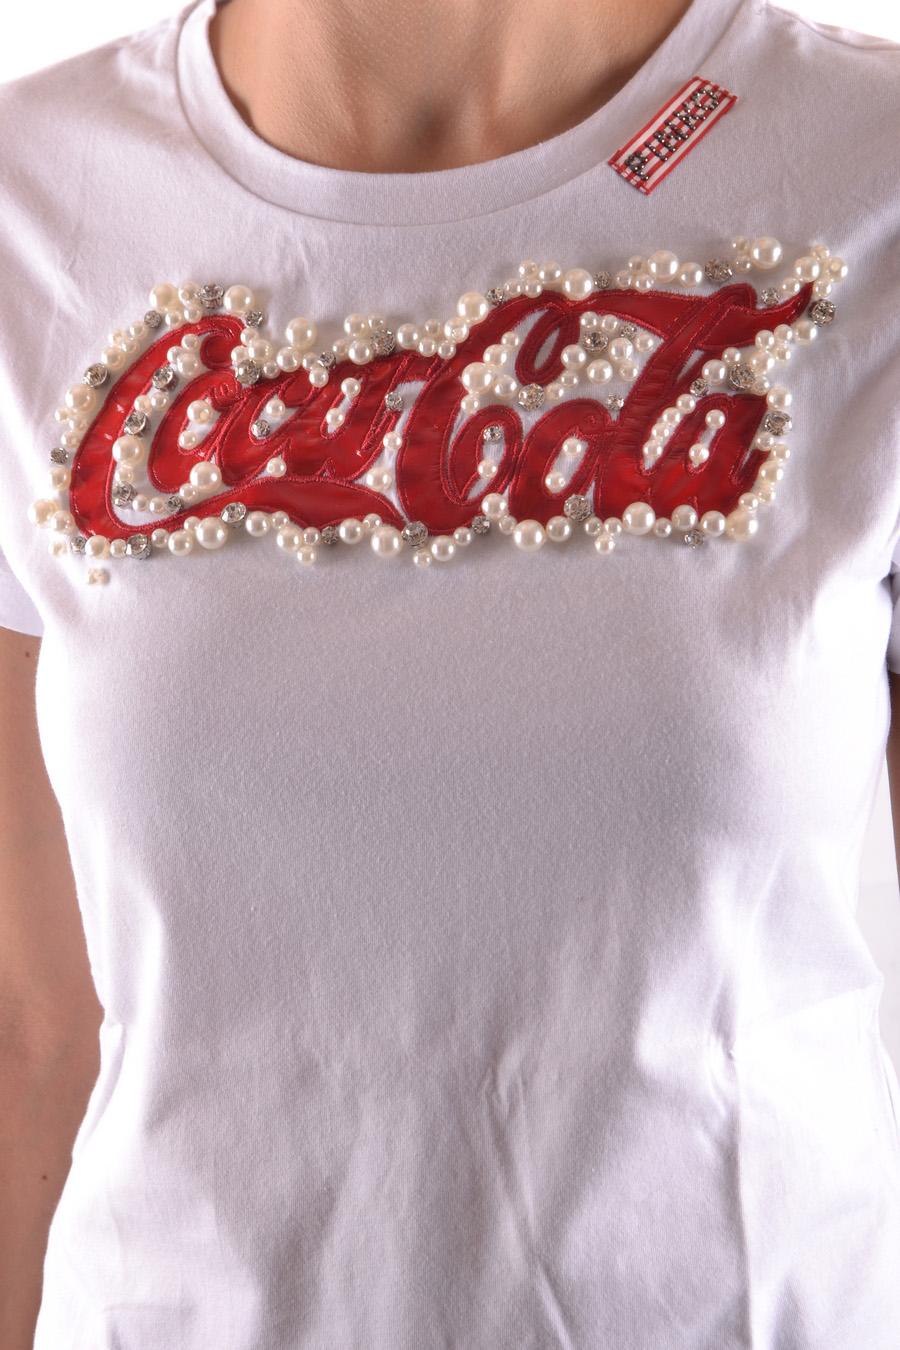 db262acc2f PINKO T-shirt | ViganoBoutique.com